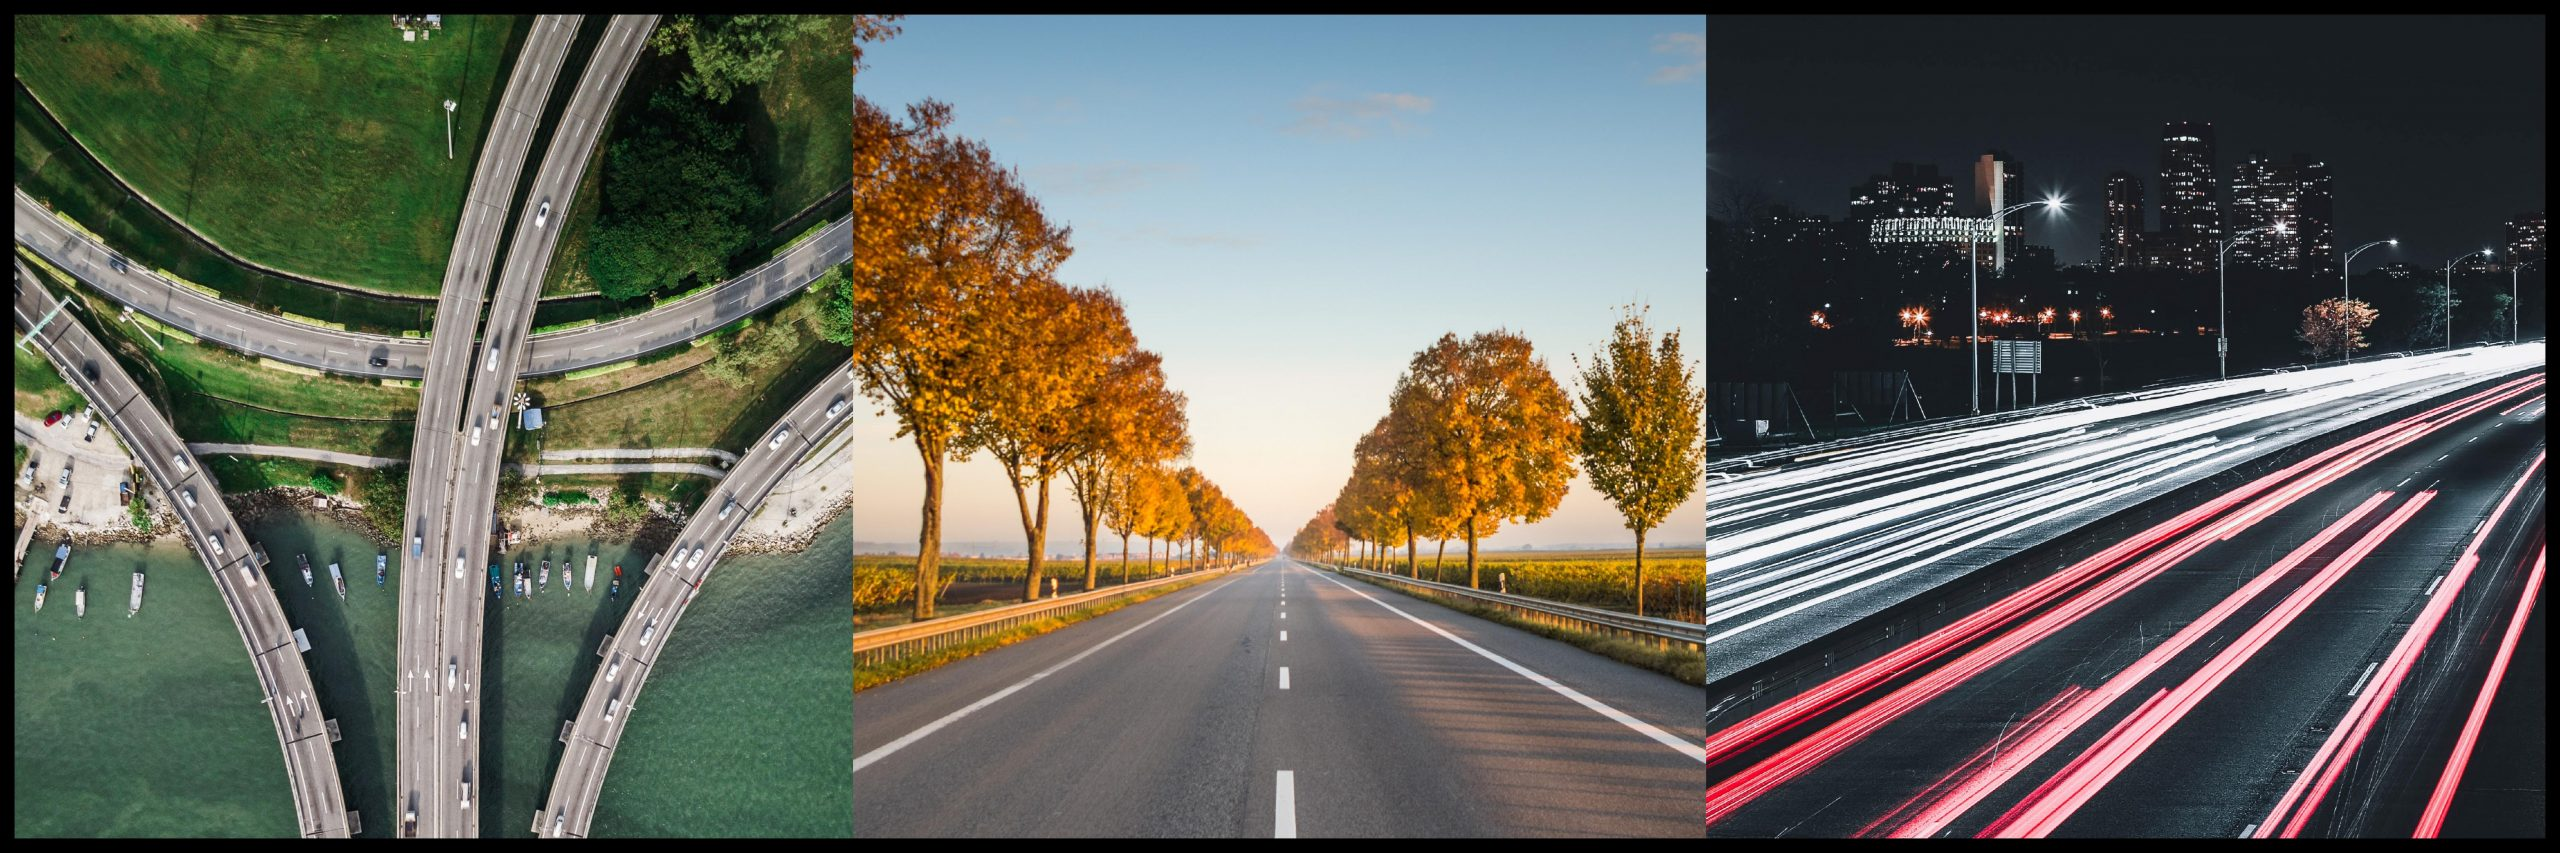 foto de carreteras